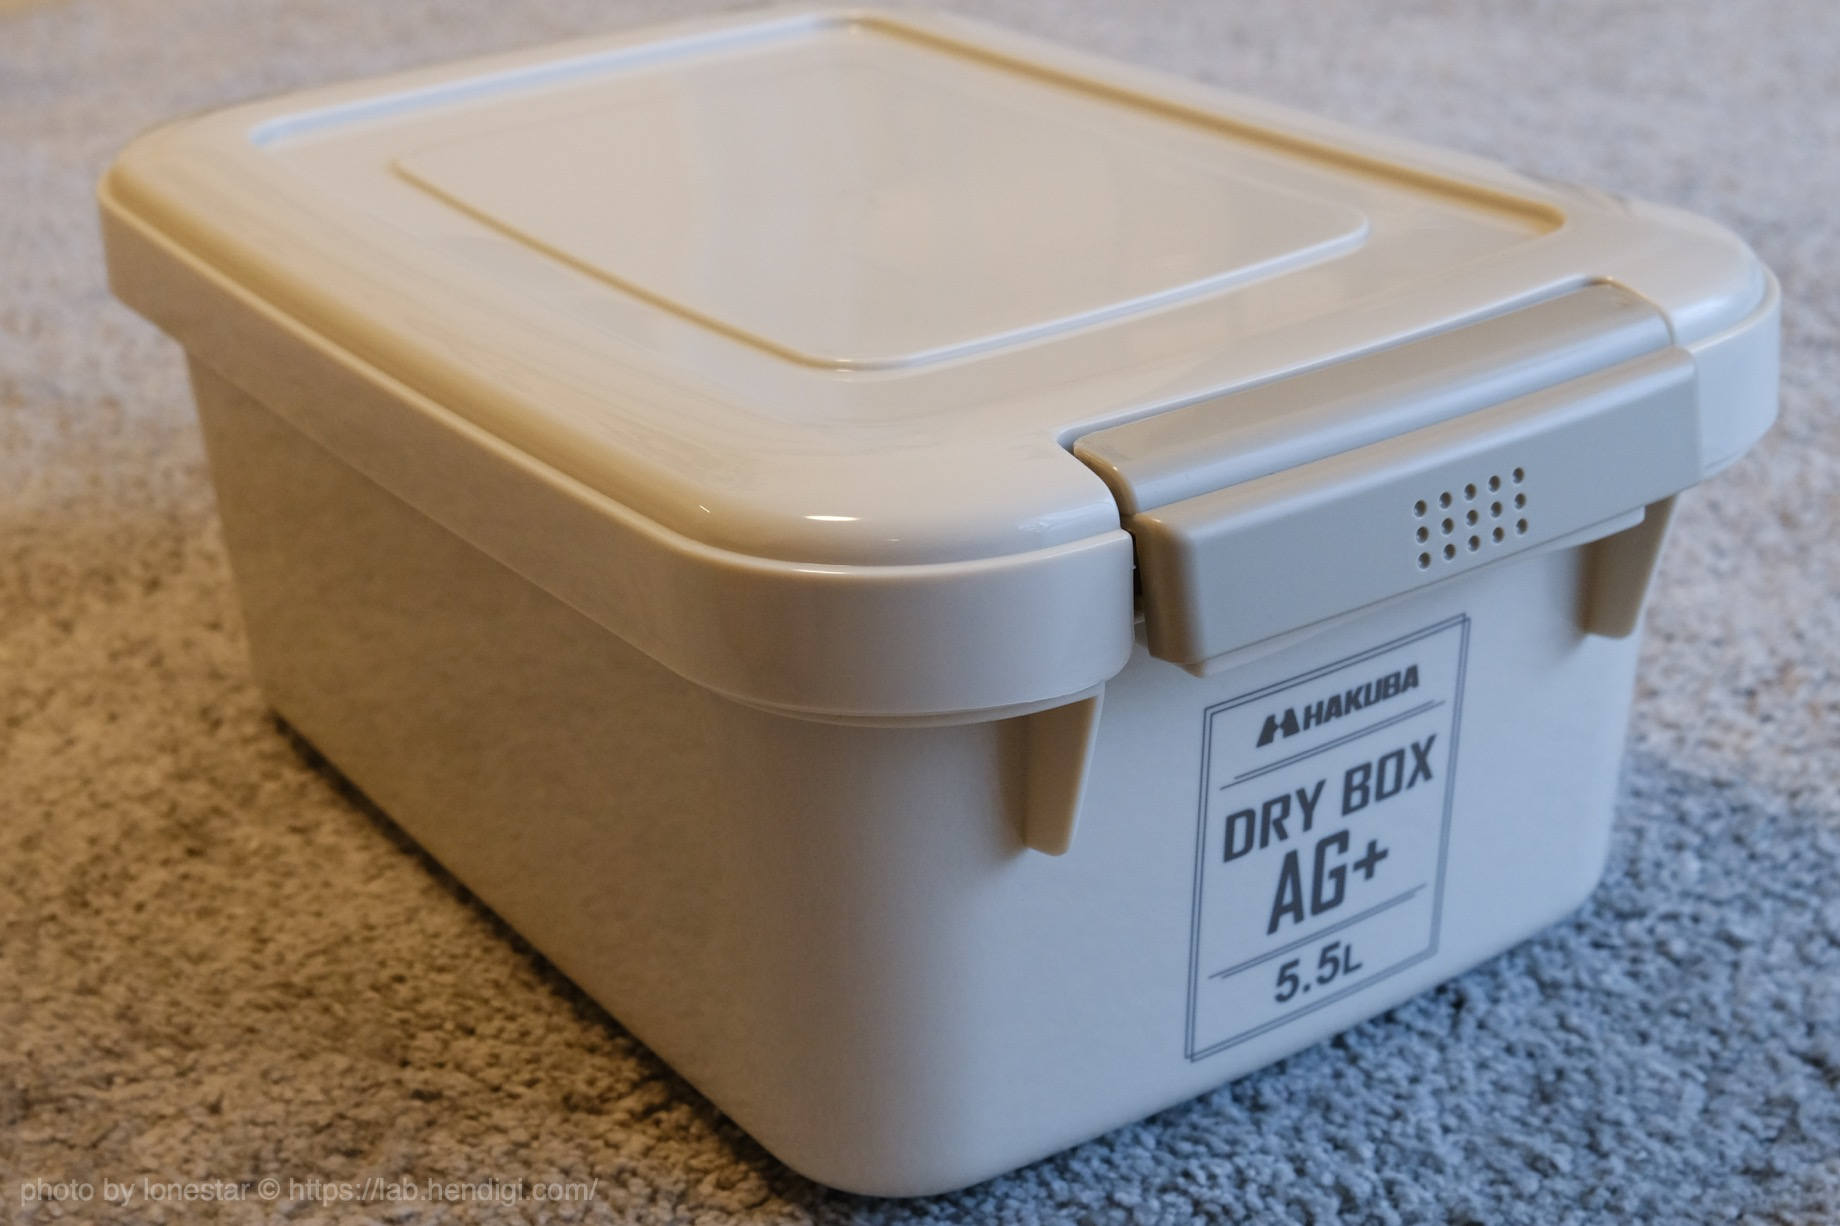 HAKUBA 防湿保管ケース ドライボックス AG+ レビュー